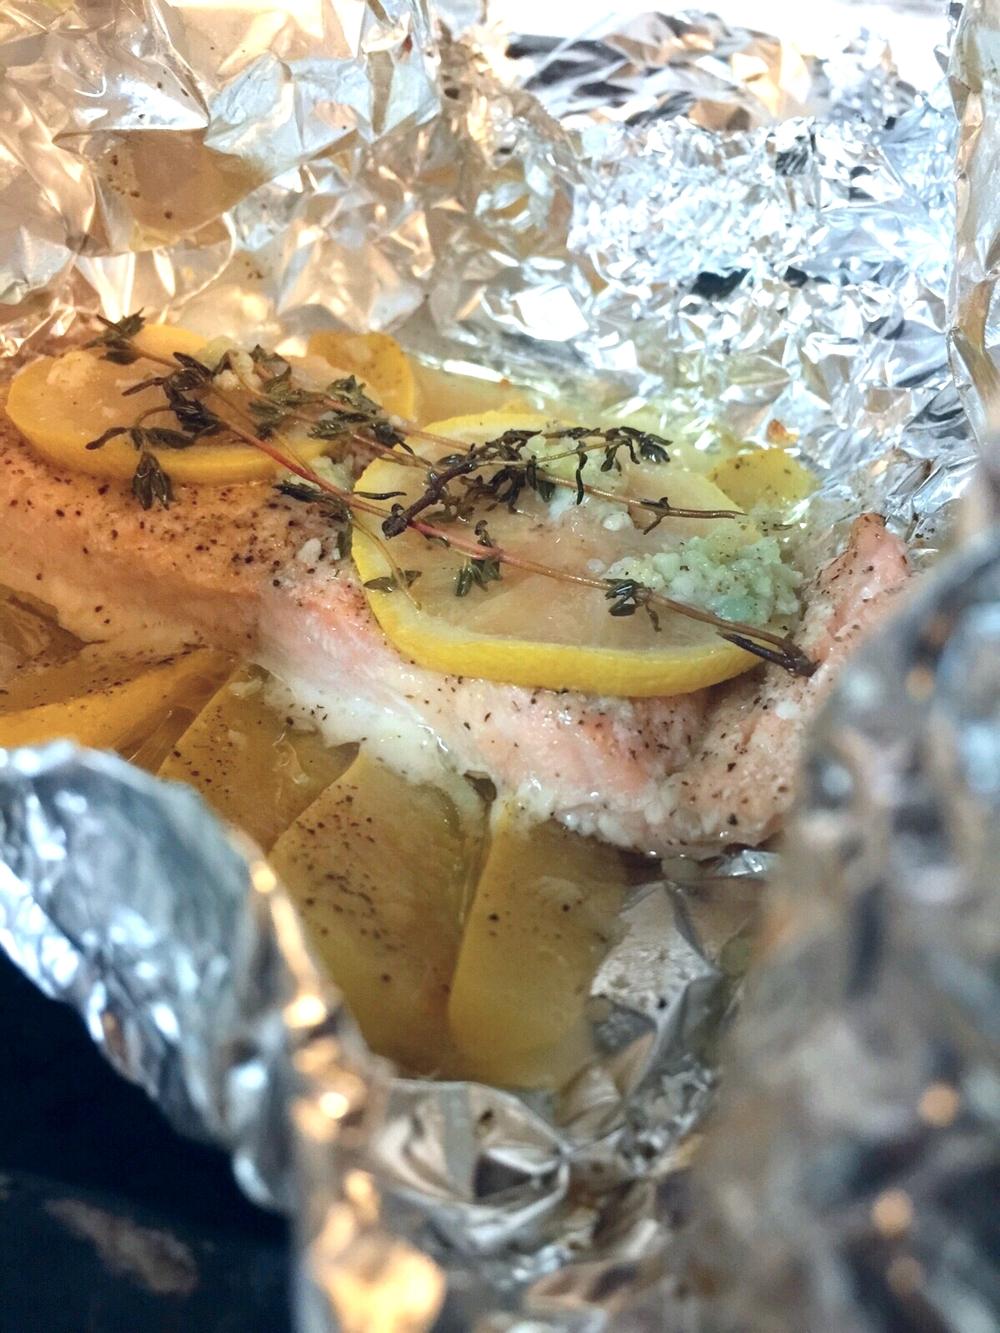 Lemon Garlic Salmon and Parmesan Baked Broccoli | by: Vashti Co.